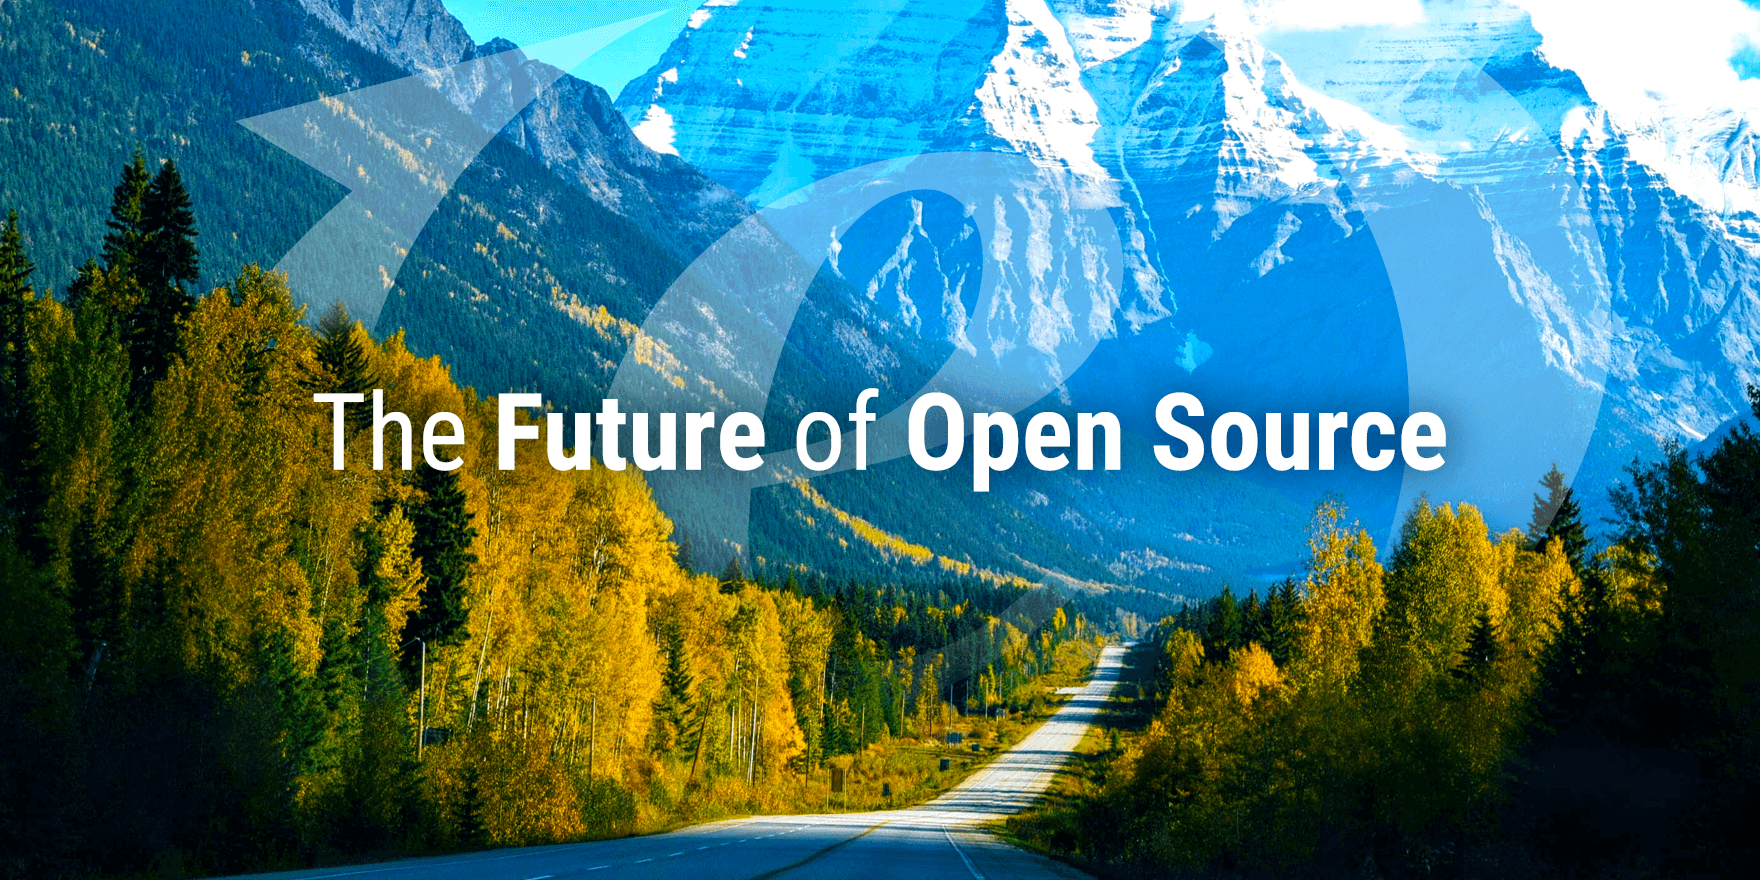 expressionengine.com - Rick Ellis - Open Source Has Won   Blog